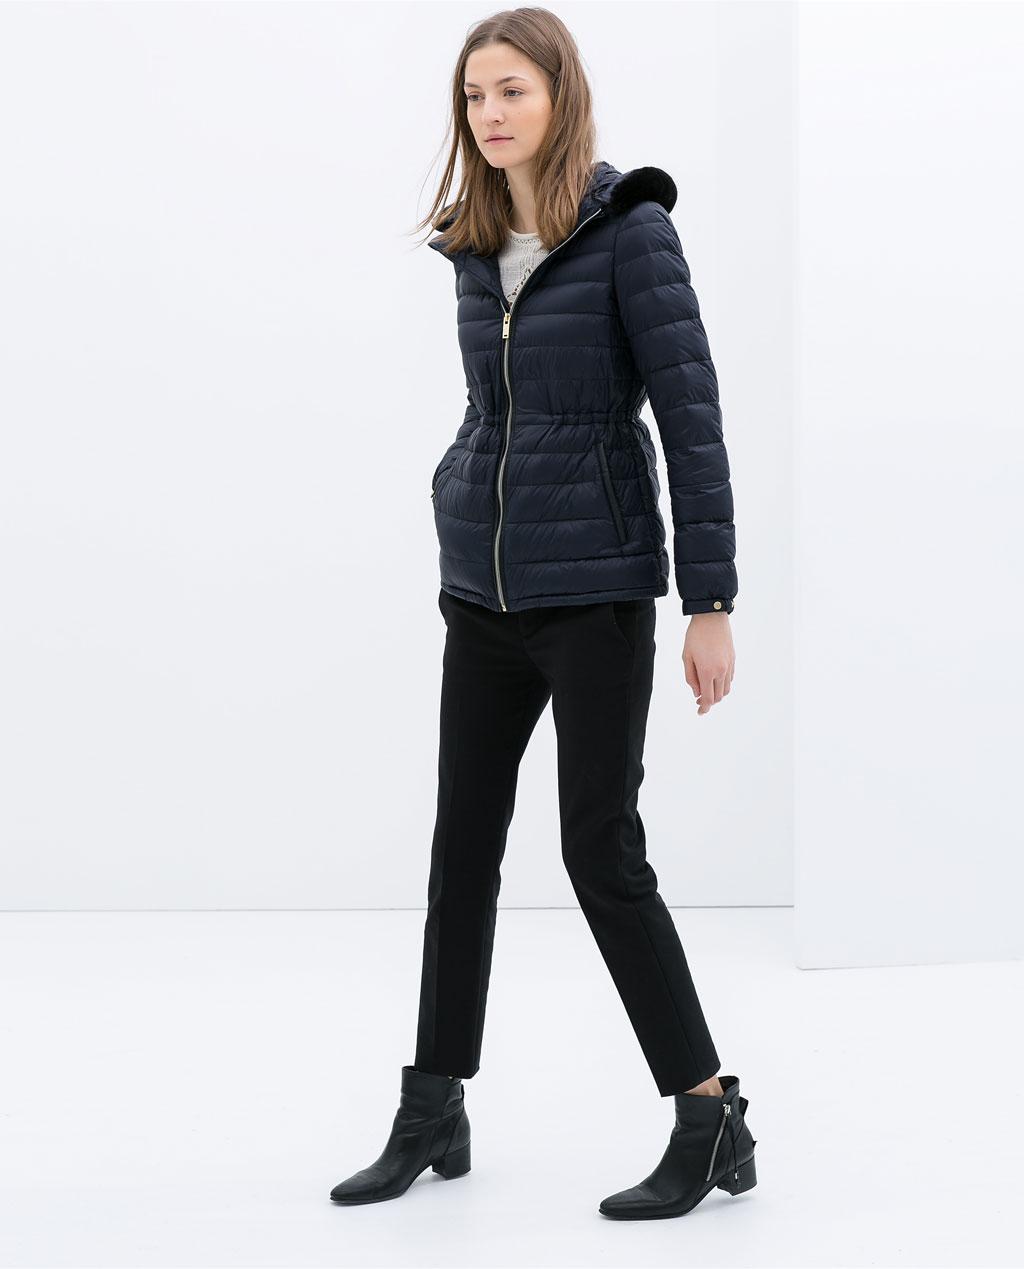 Пуховик Zara, 899 грн.